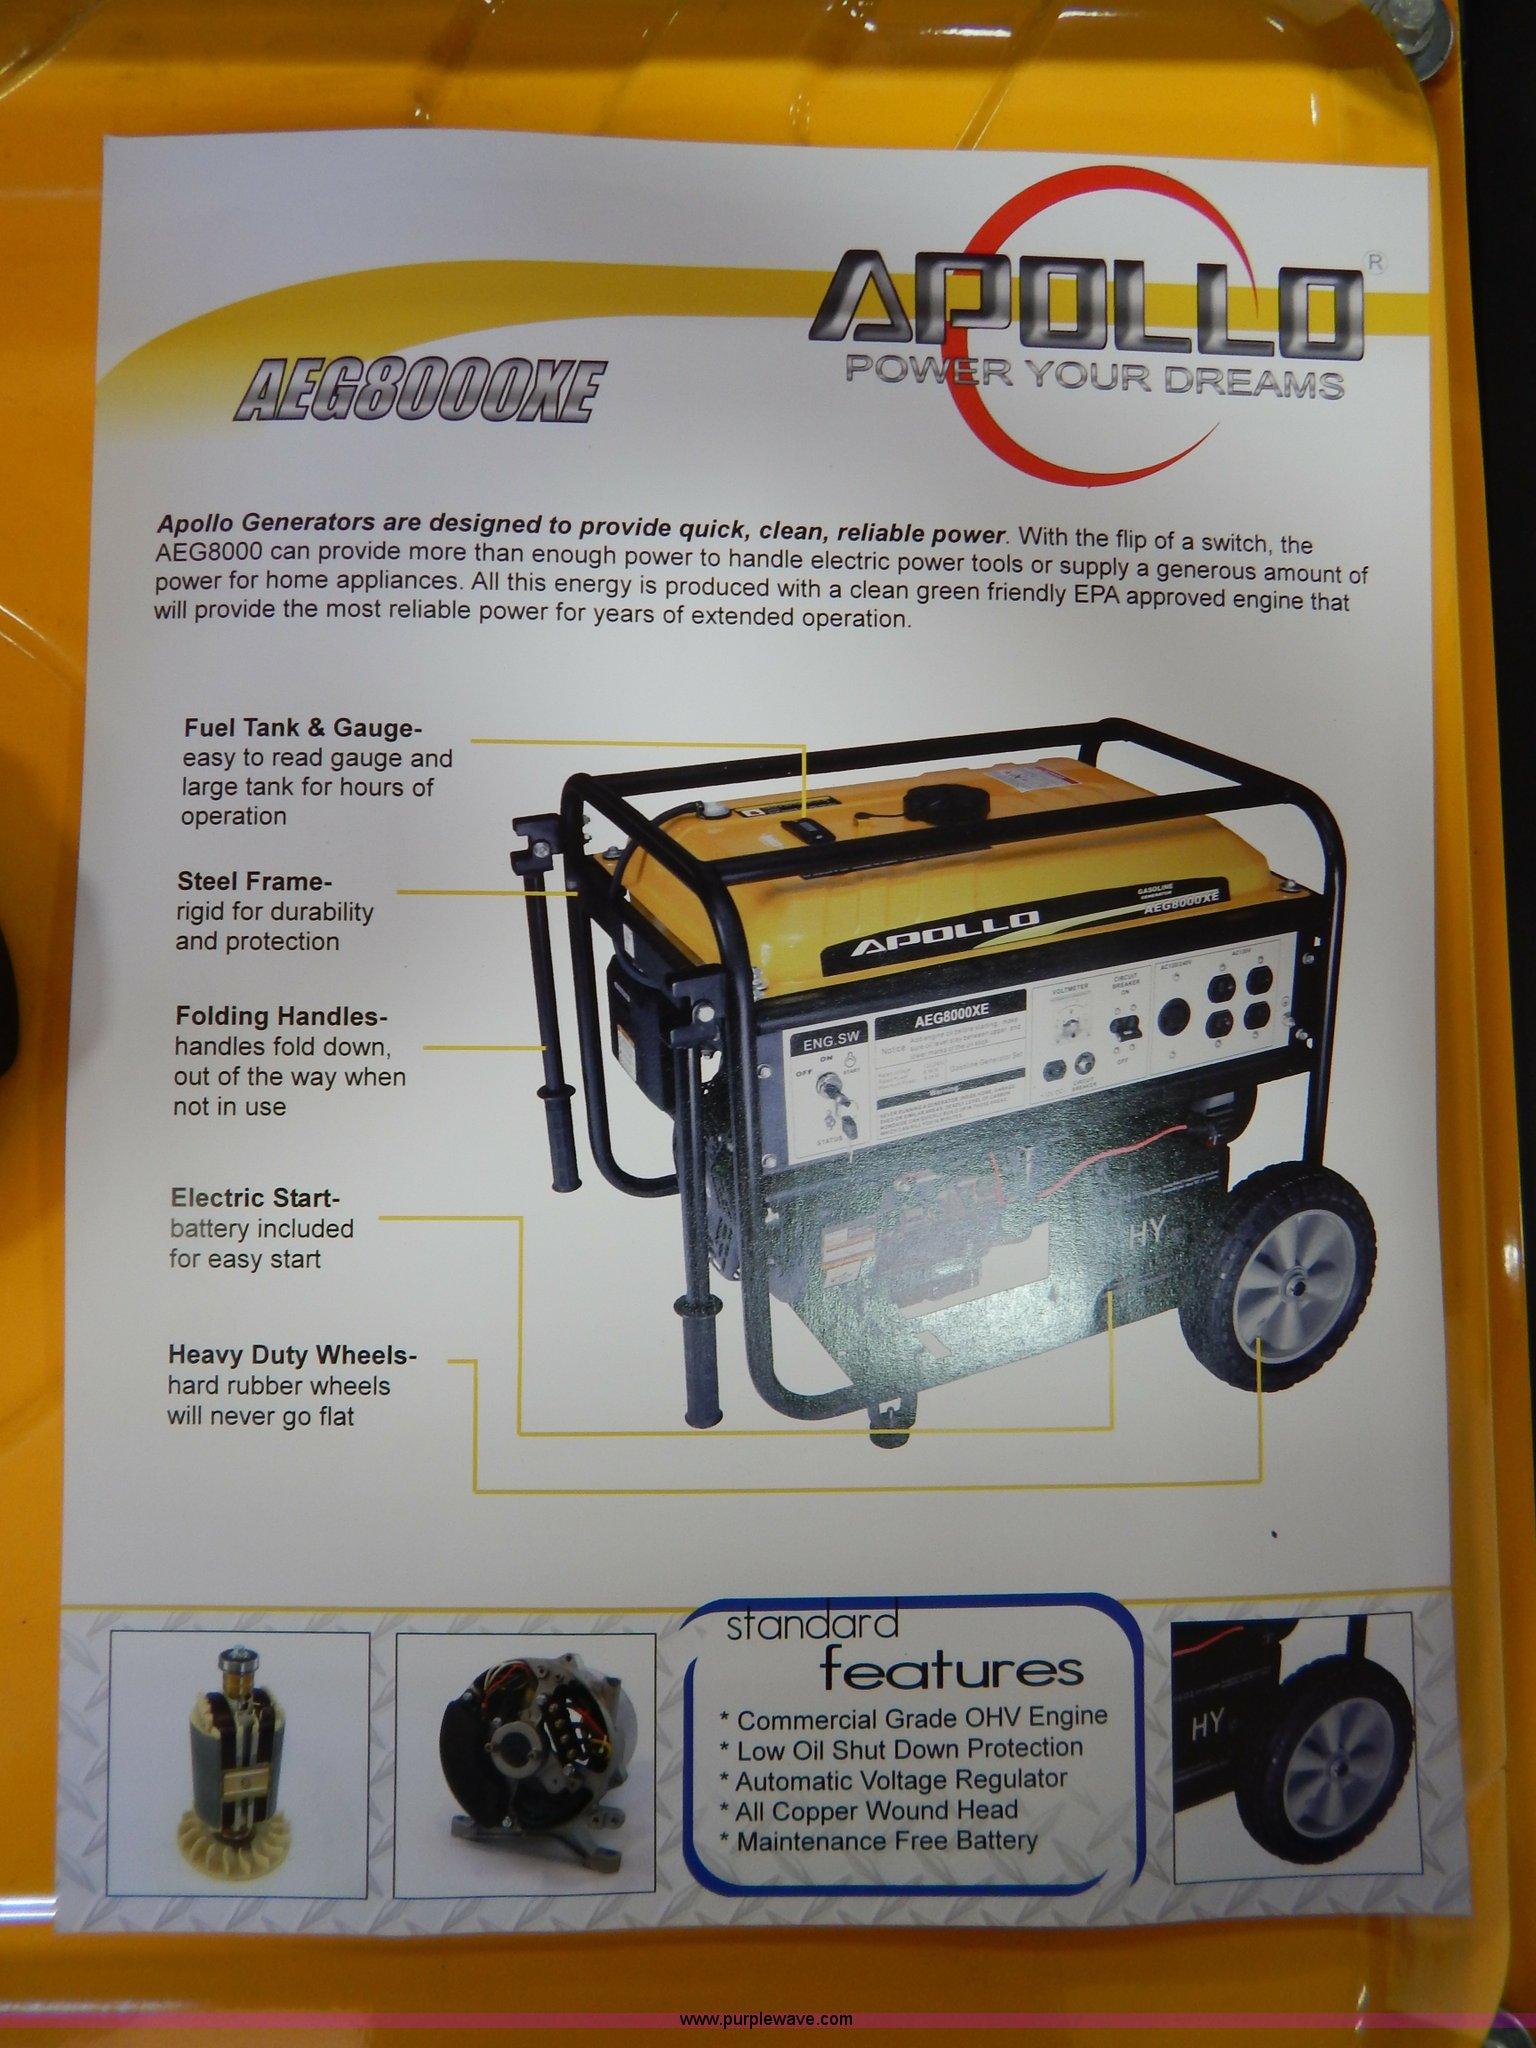 Apollo AEG8000XE generator Item AO9236